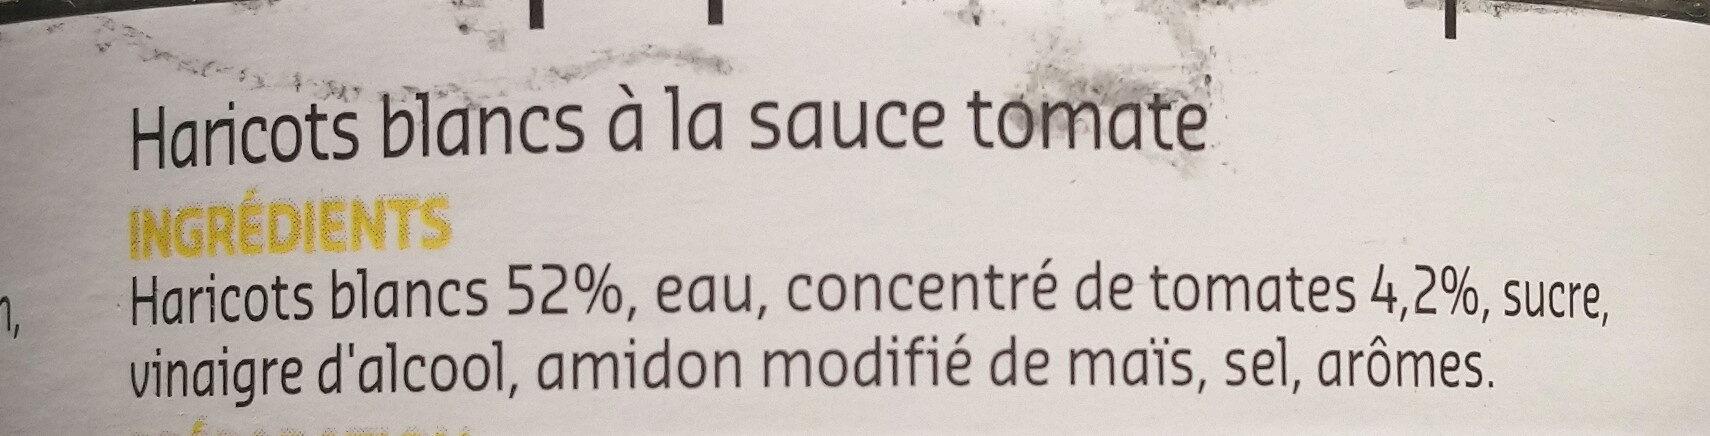 Haricot blanc a la sauce tomate - Ingredients - fr